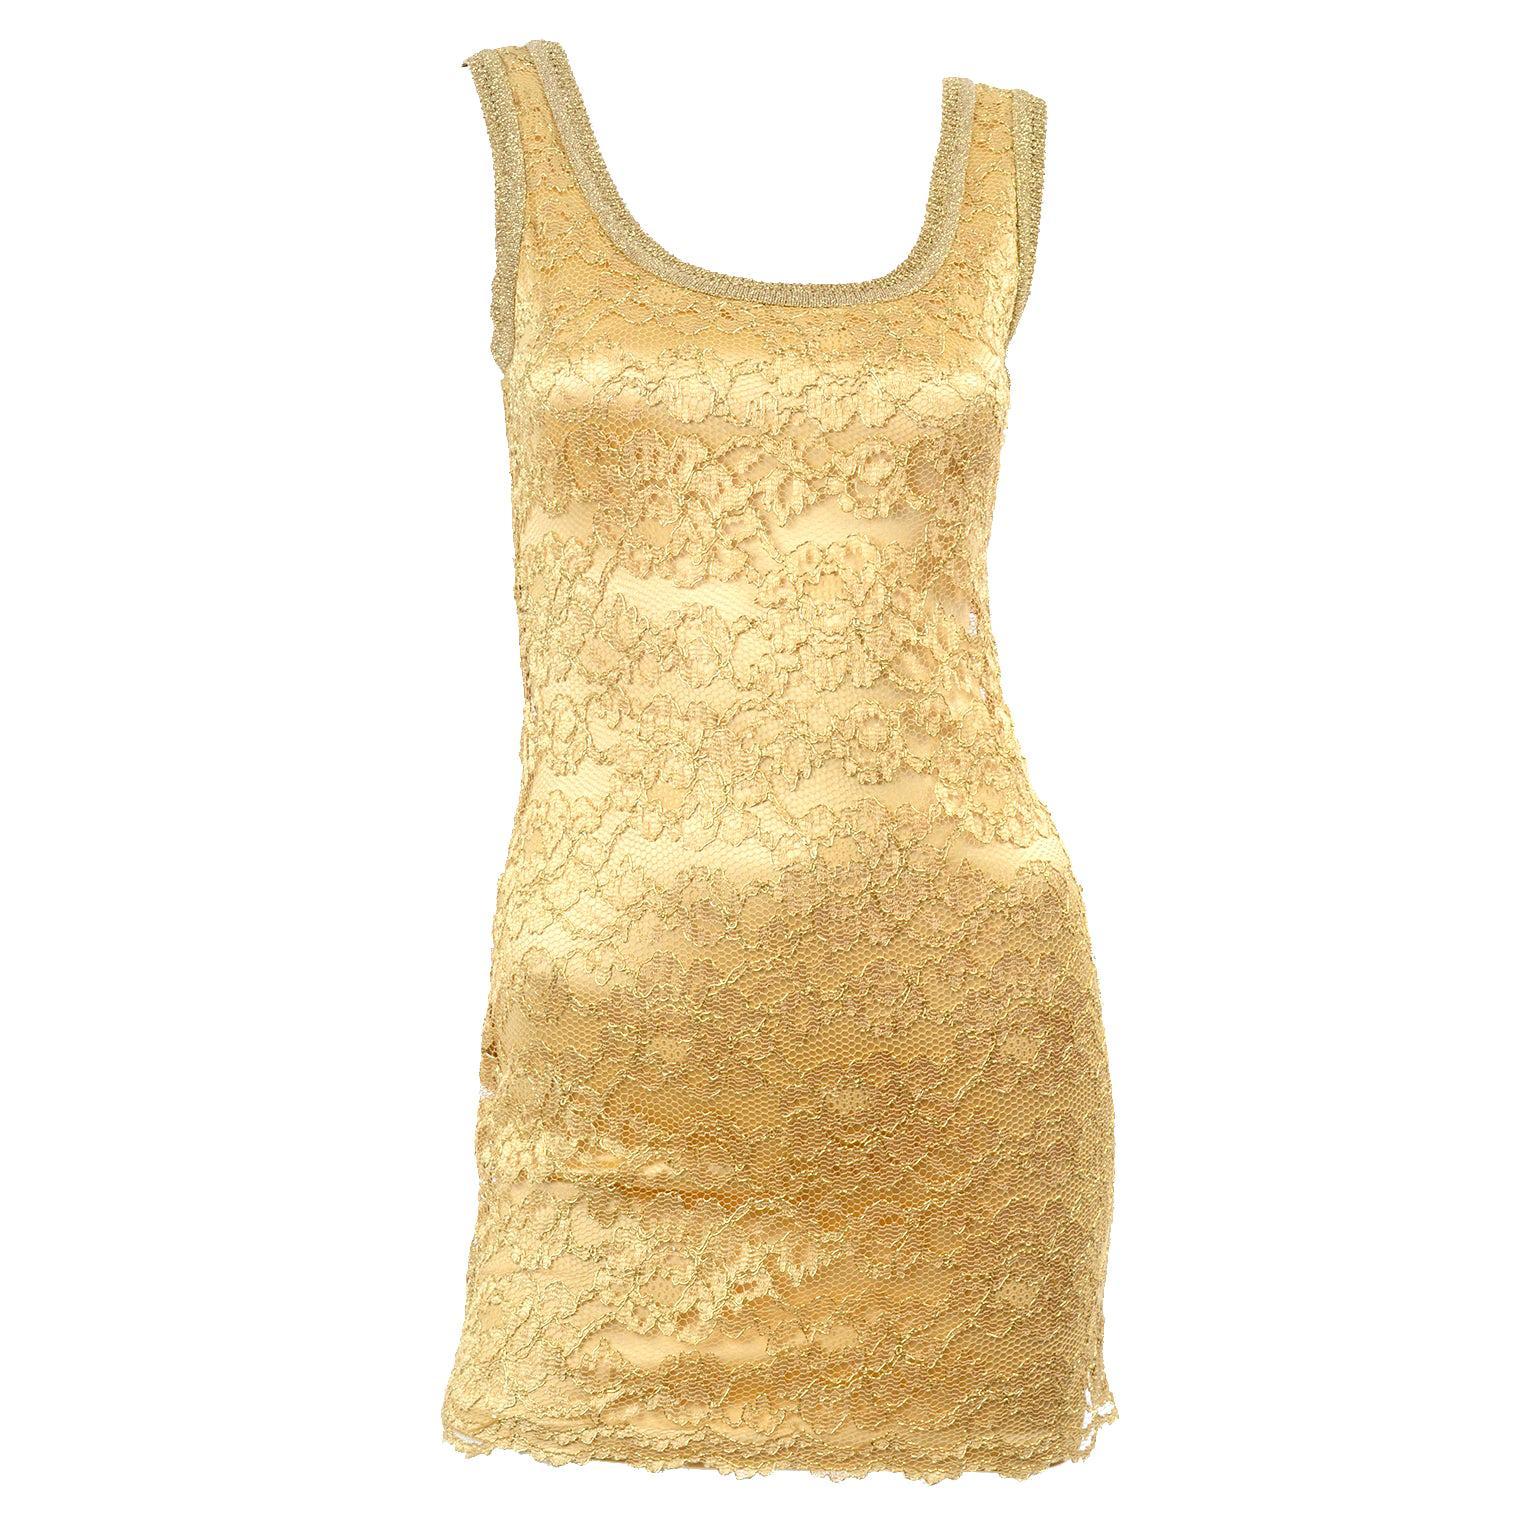 Gruppo GFT Bergdorf Goodman Vintage Gold Stretch Lace Designer Bodycon Dress